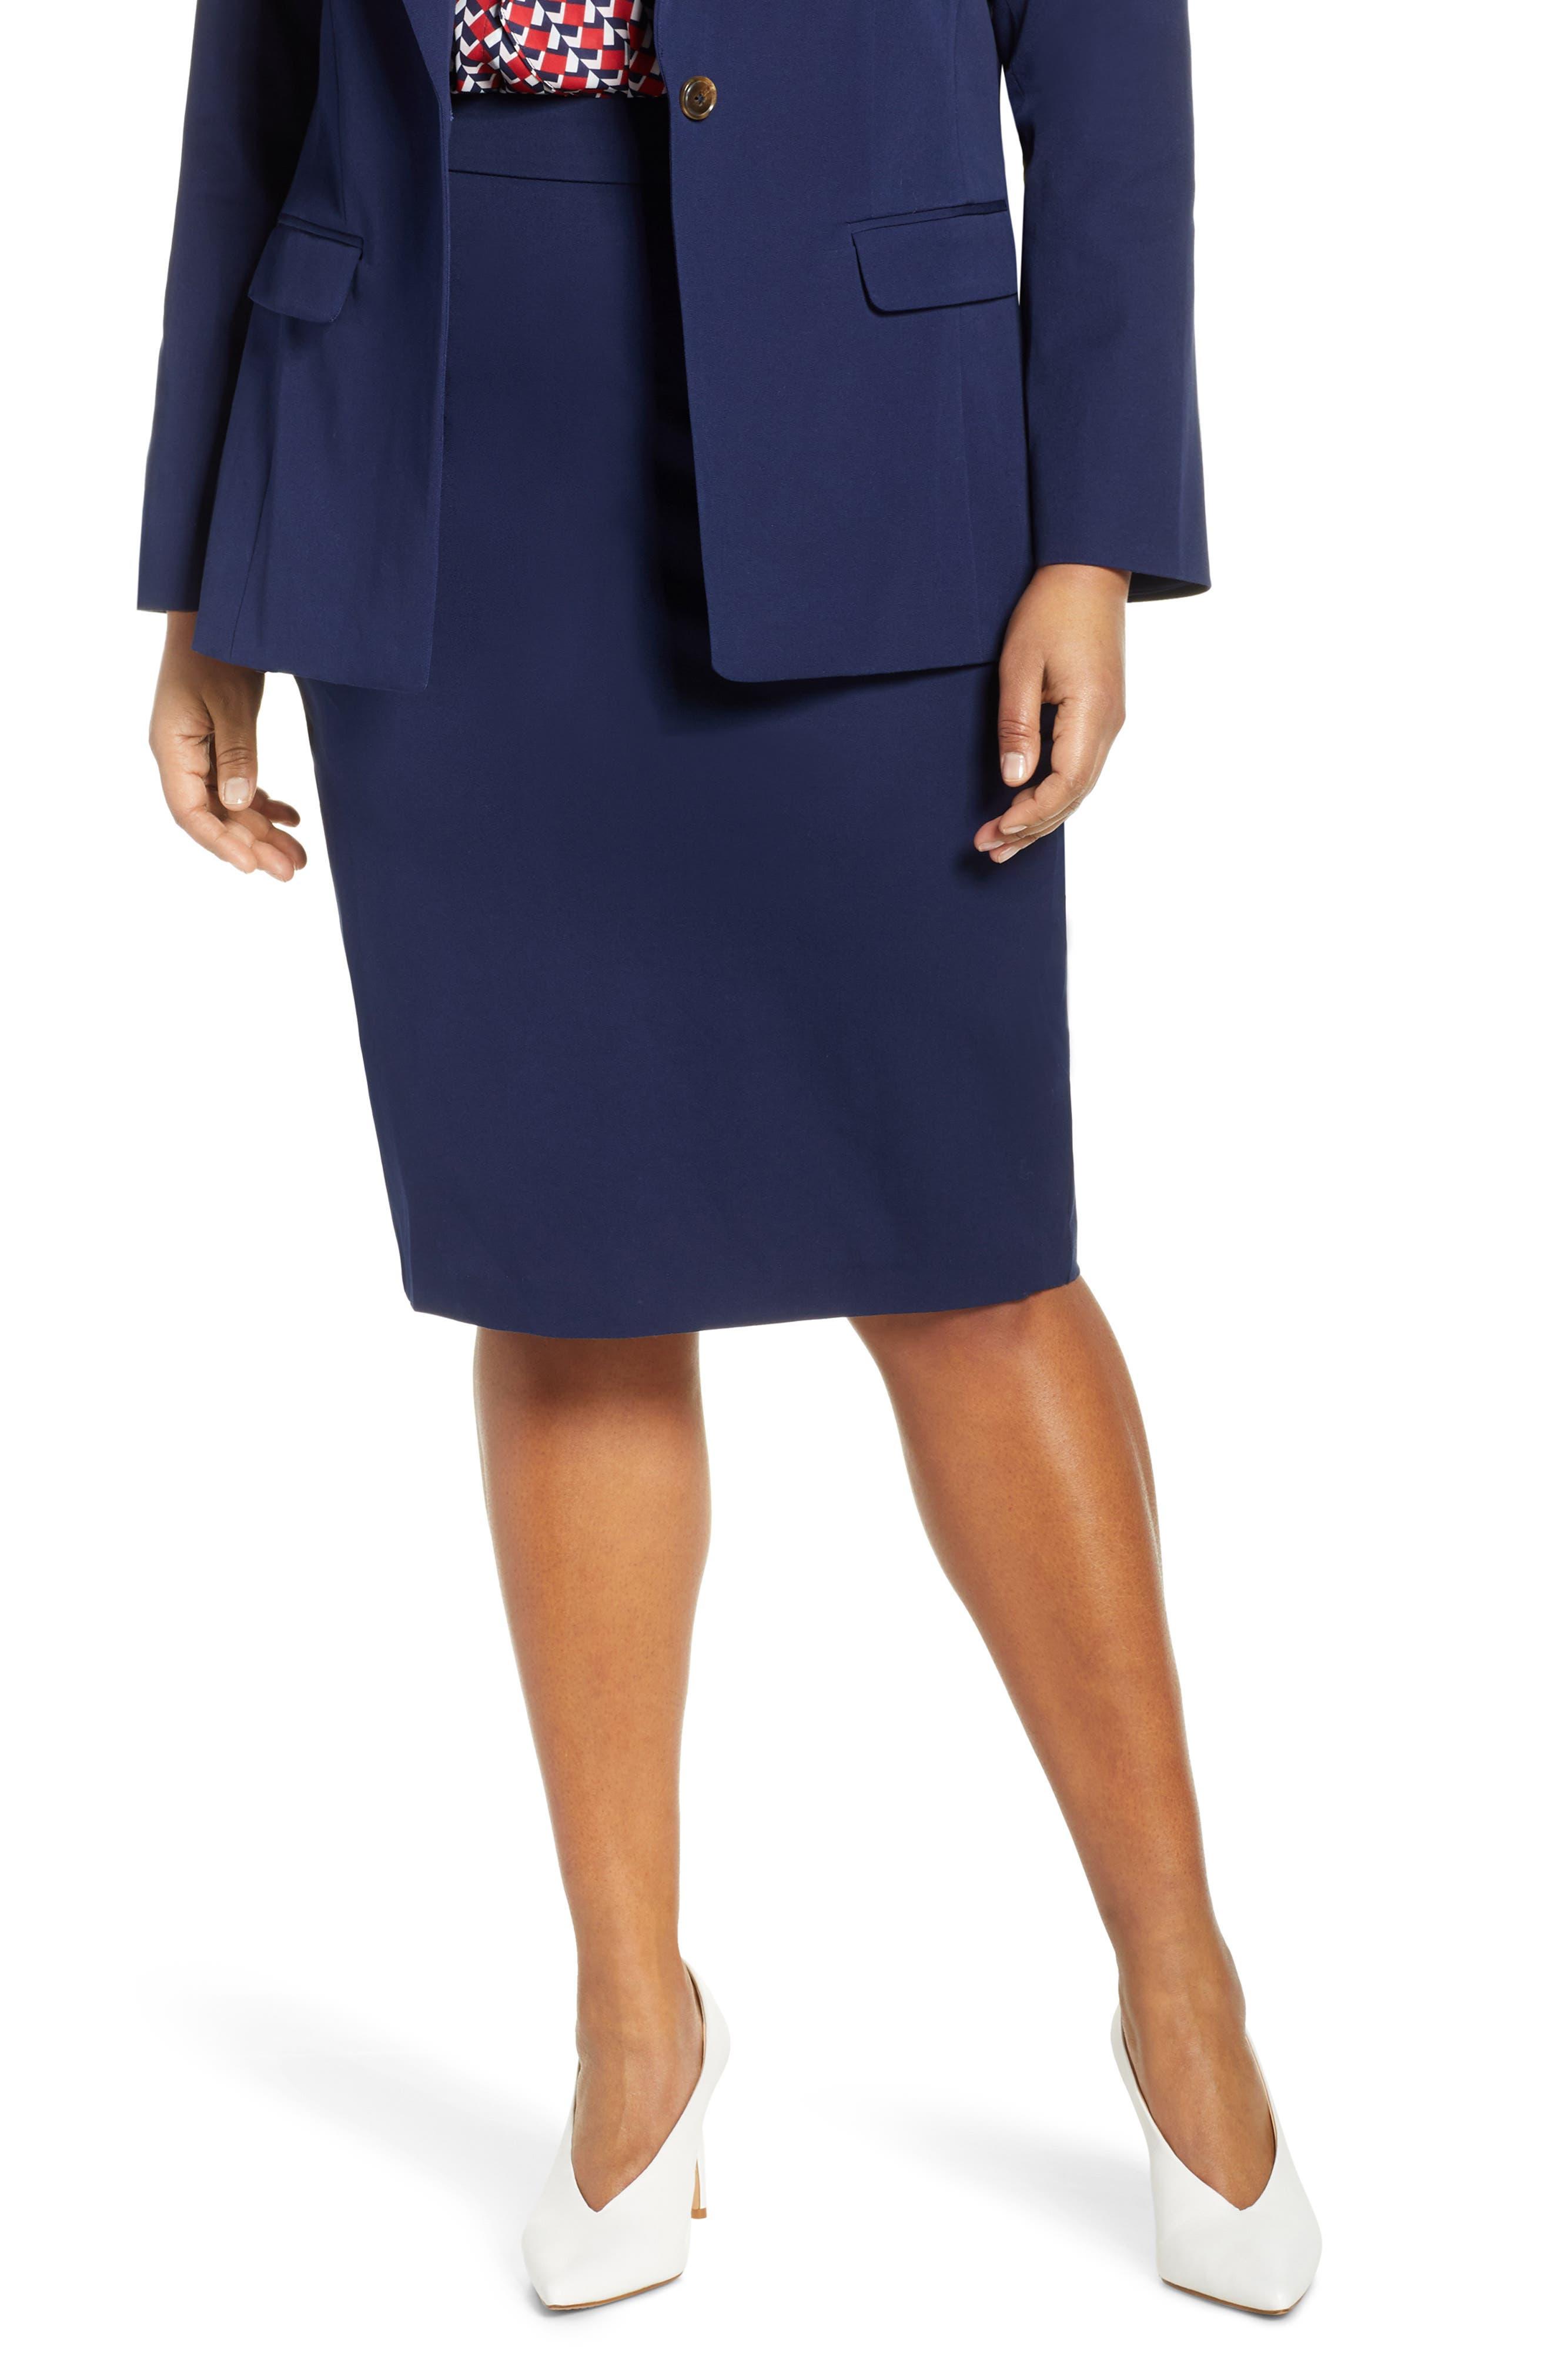 09a985f3e Black Ripped Denim Skirt Plus Size